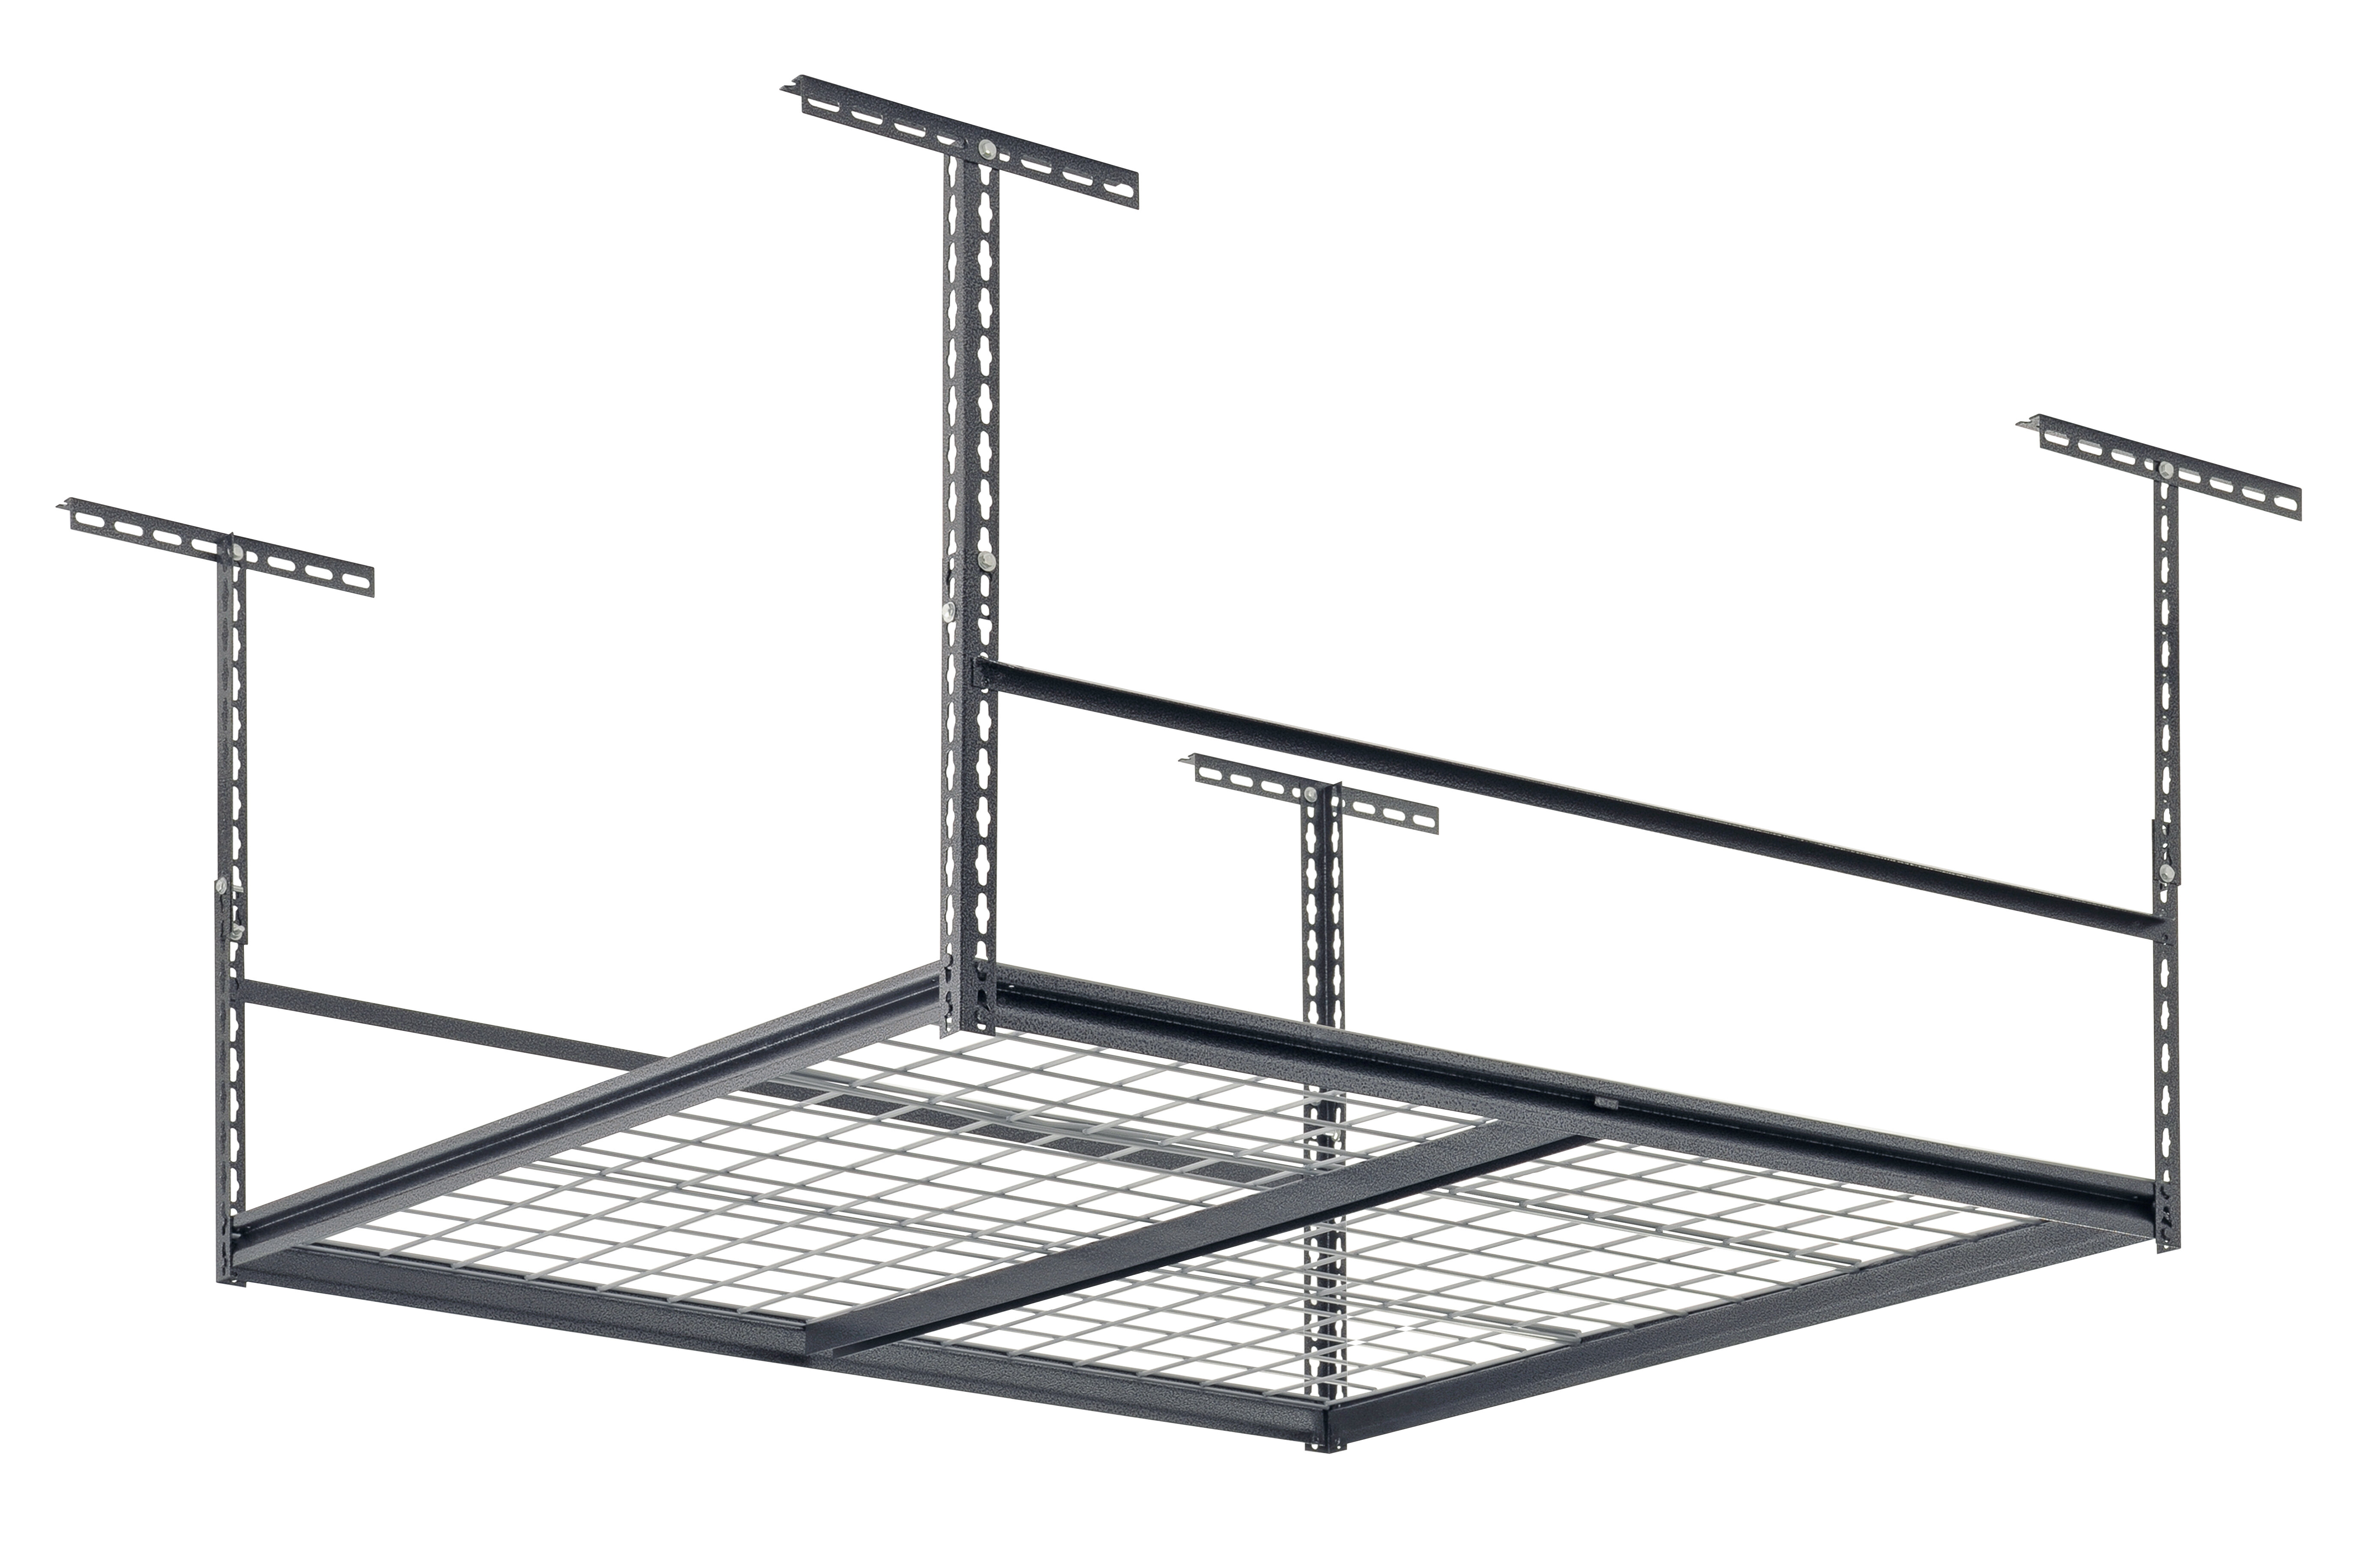 Sandusky Overhead Garage Adjustable Ceiling Storage Rack Reviews Wayfair